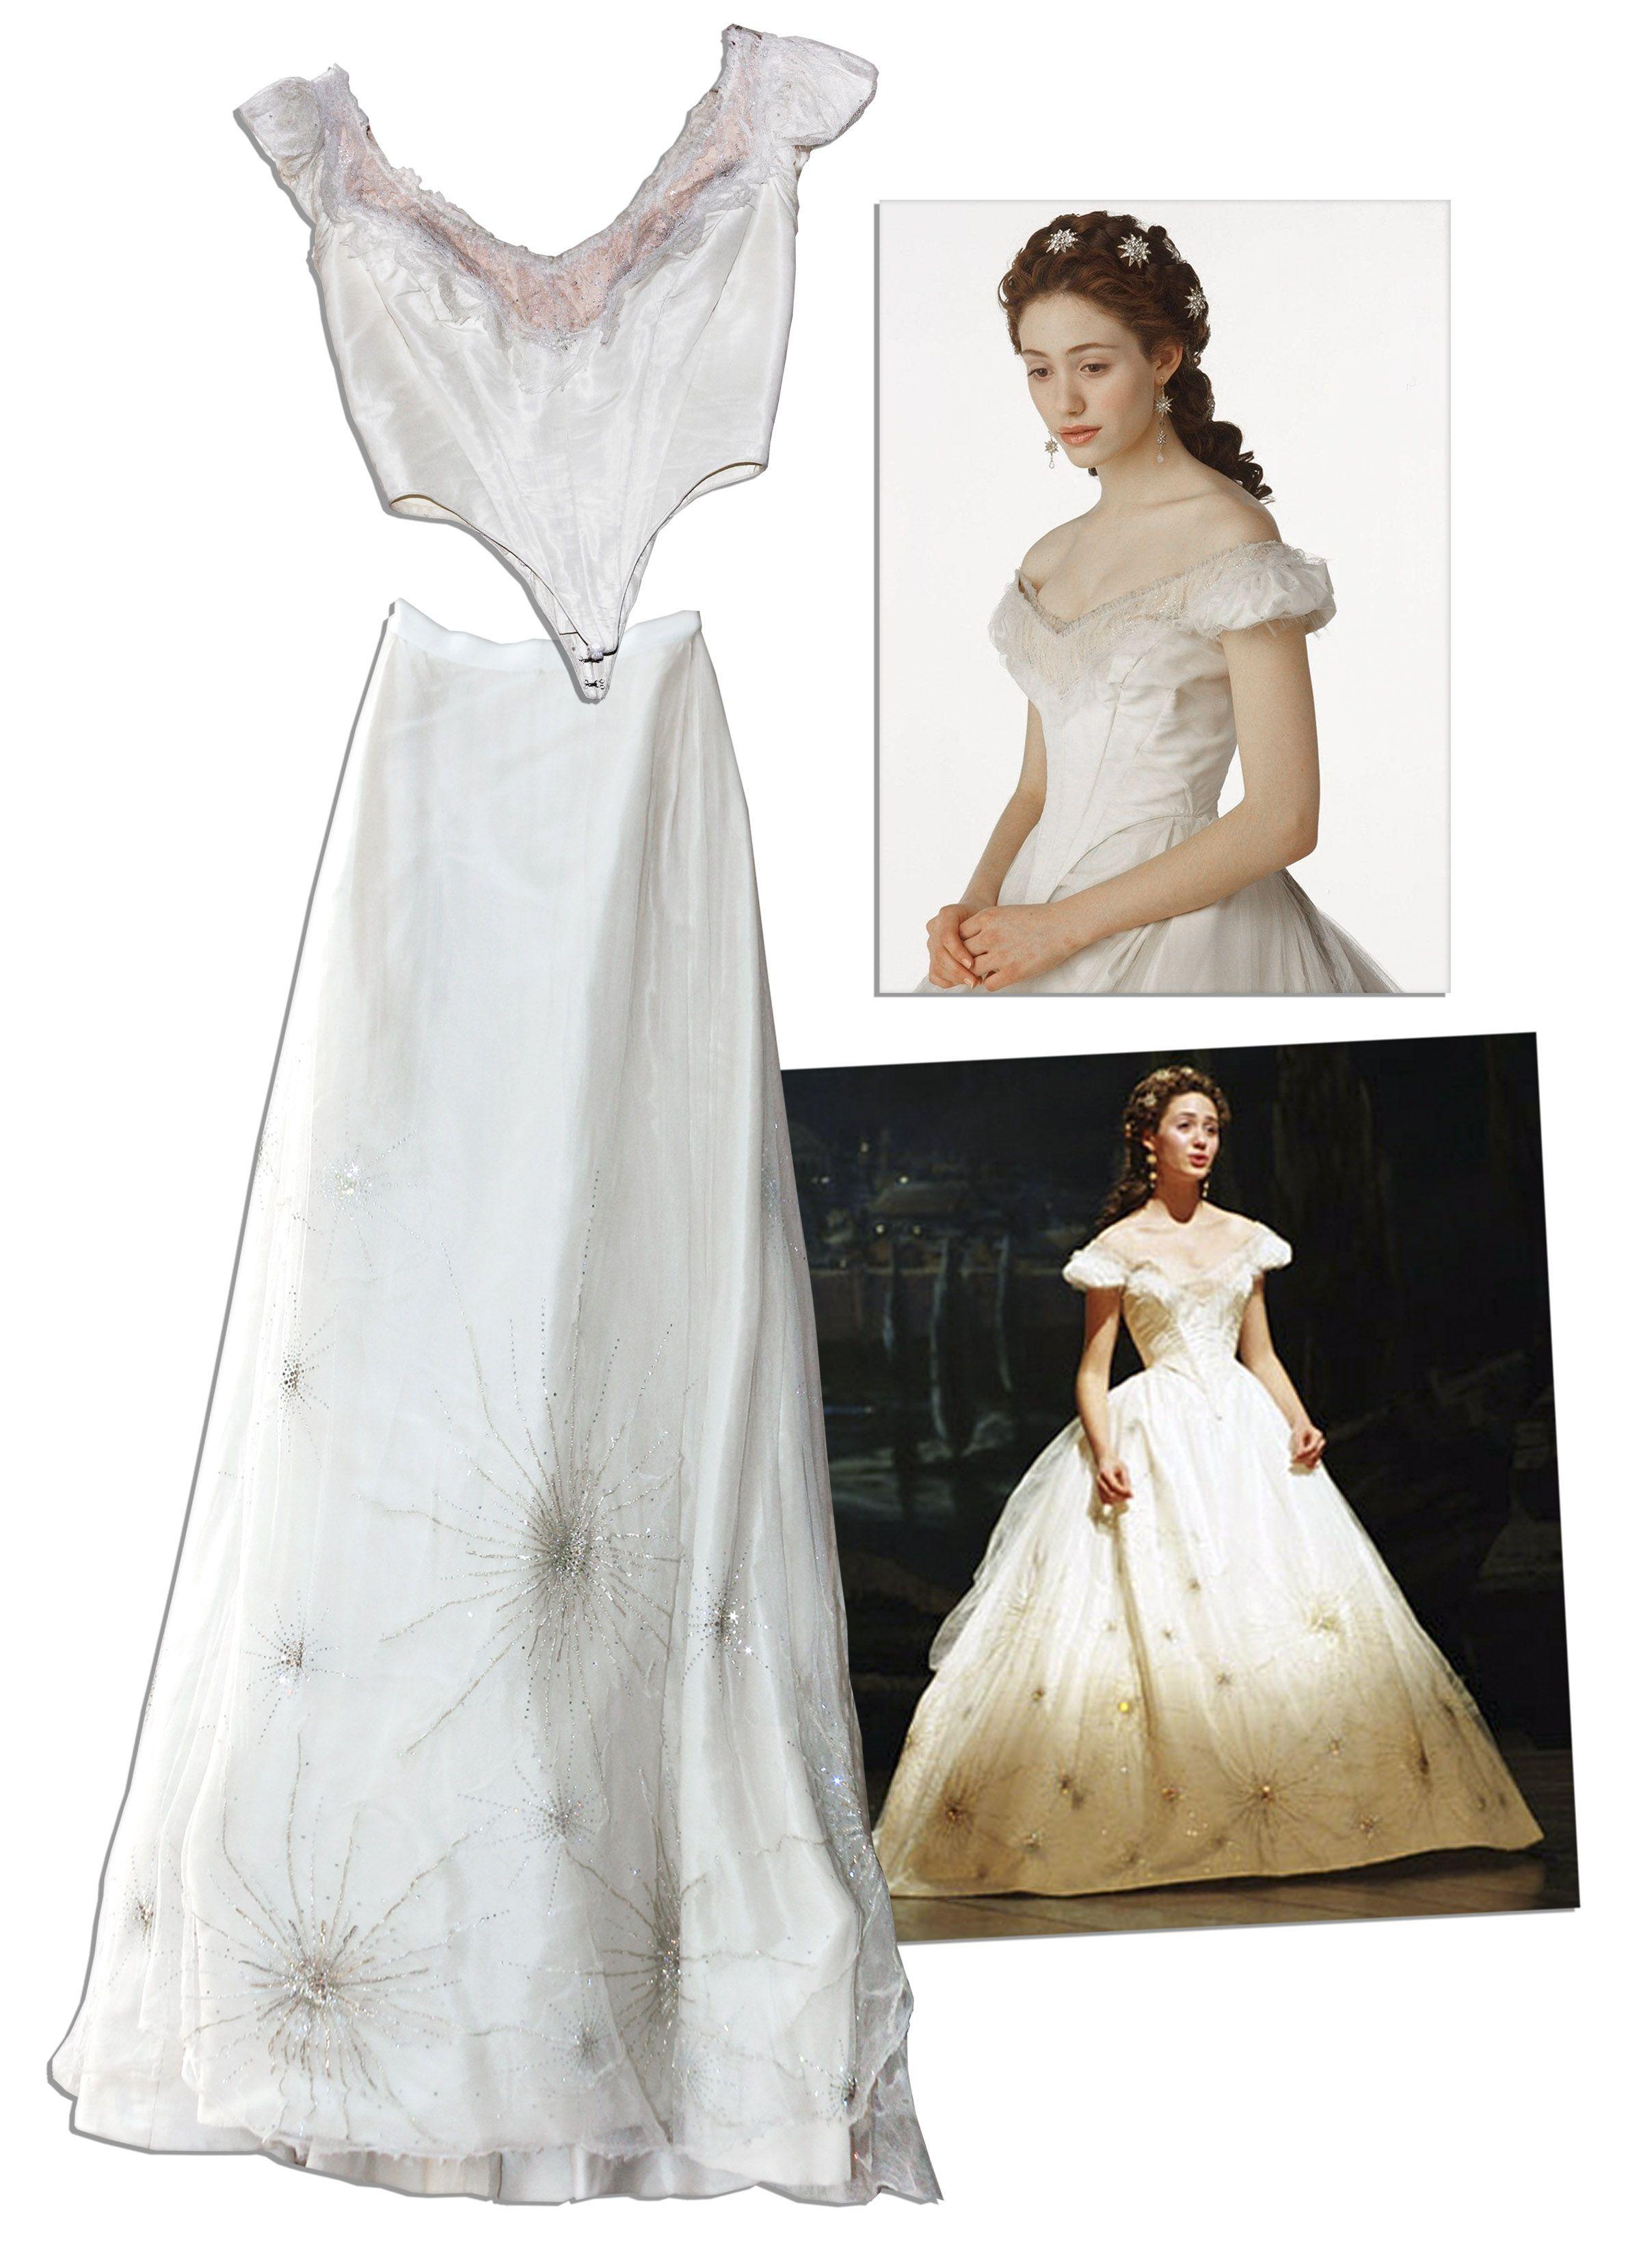 Phantom of the opera wedding dress emmy google search for Phantom of the opera wedding dress